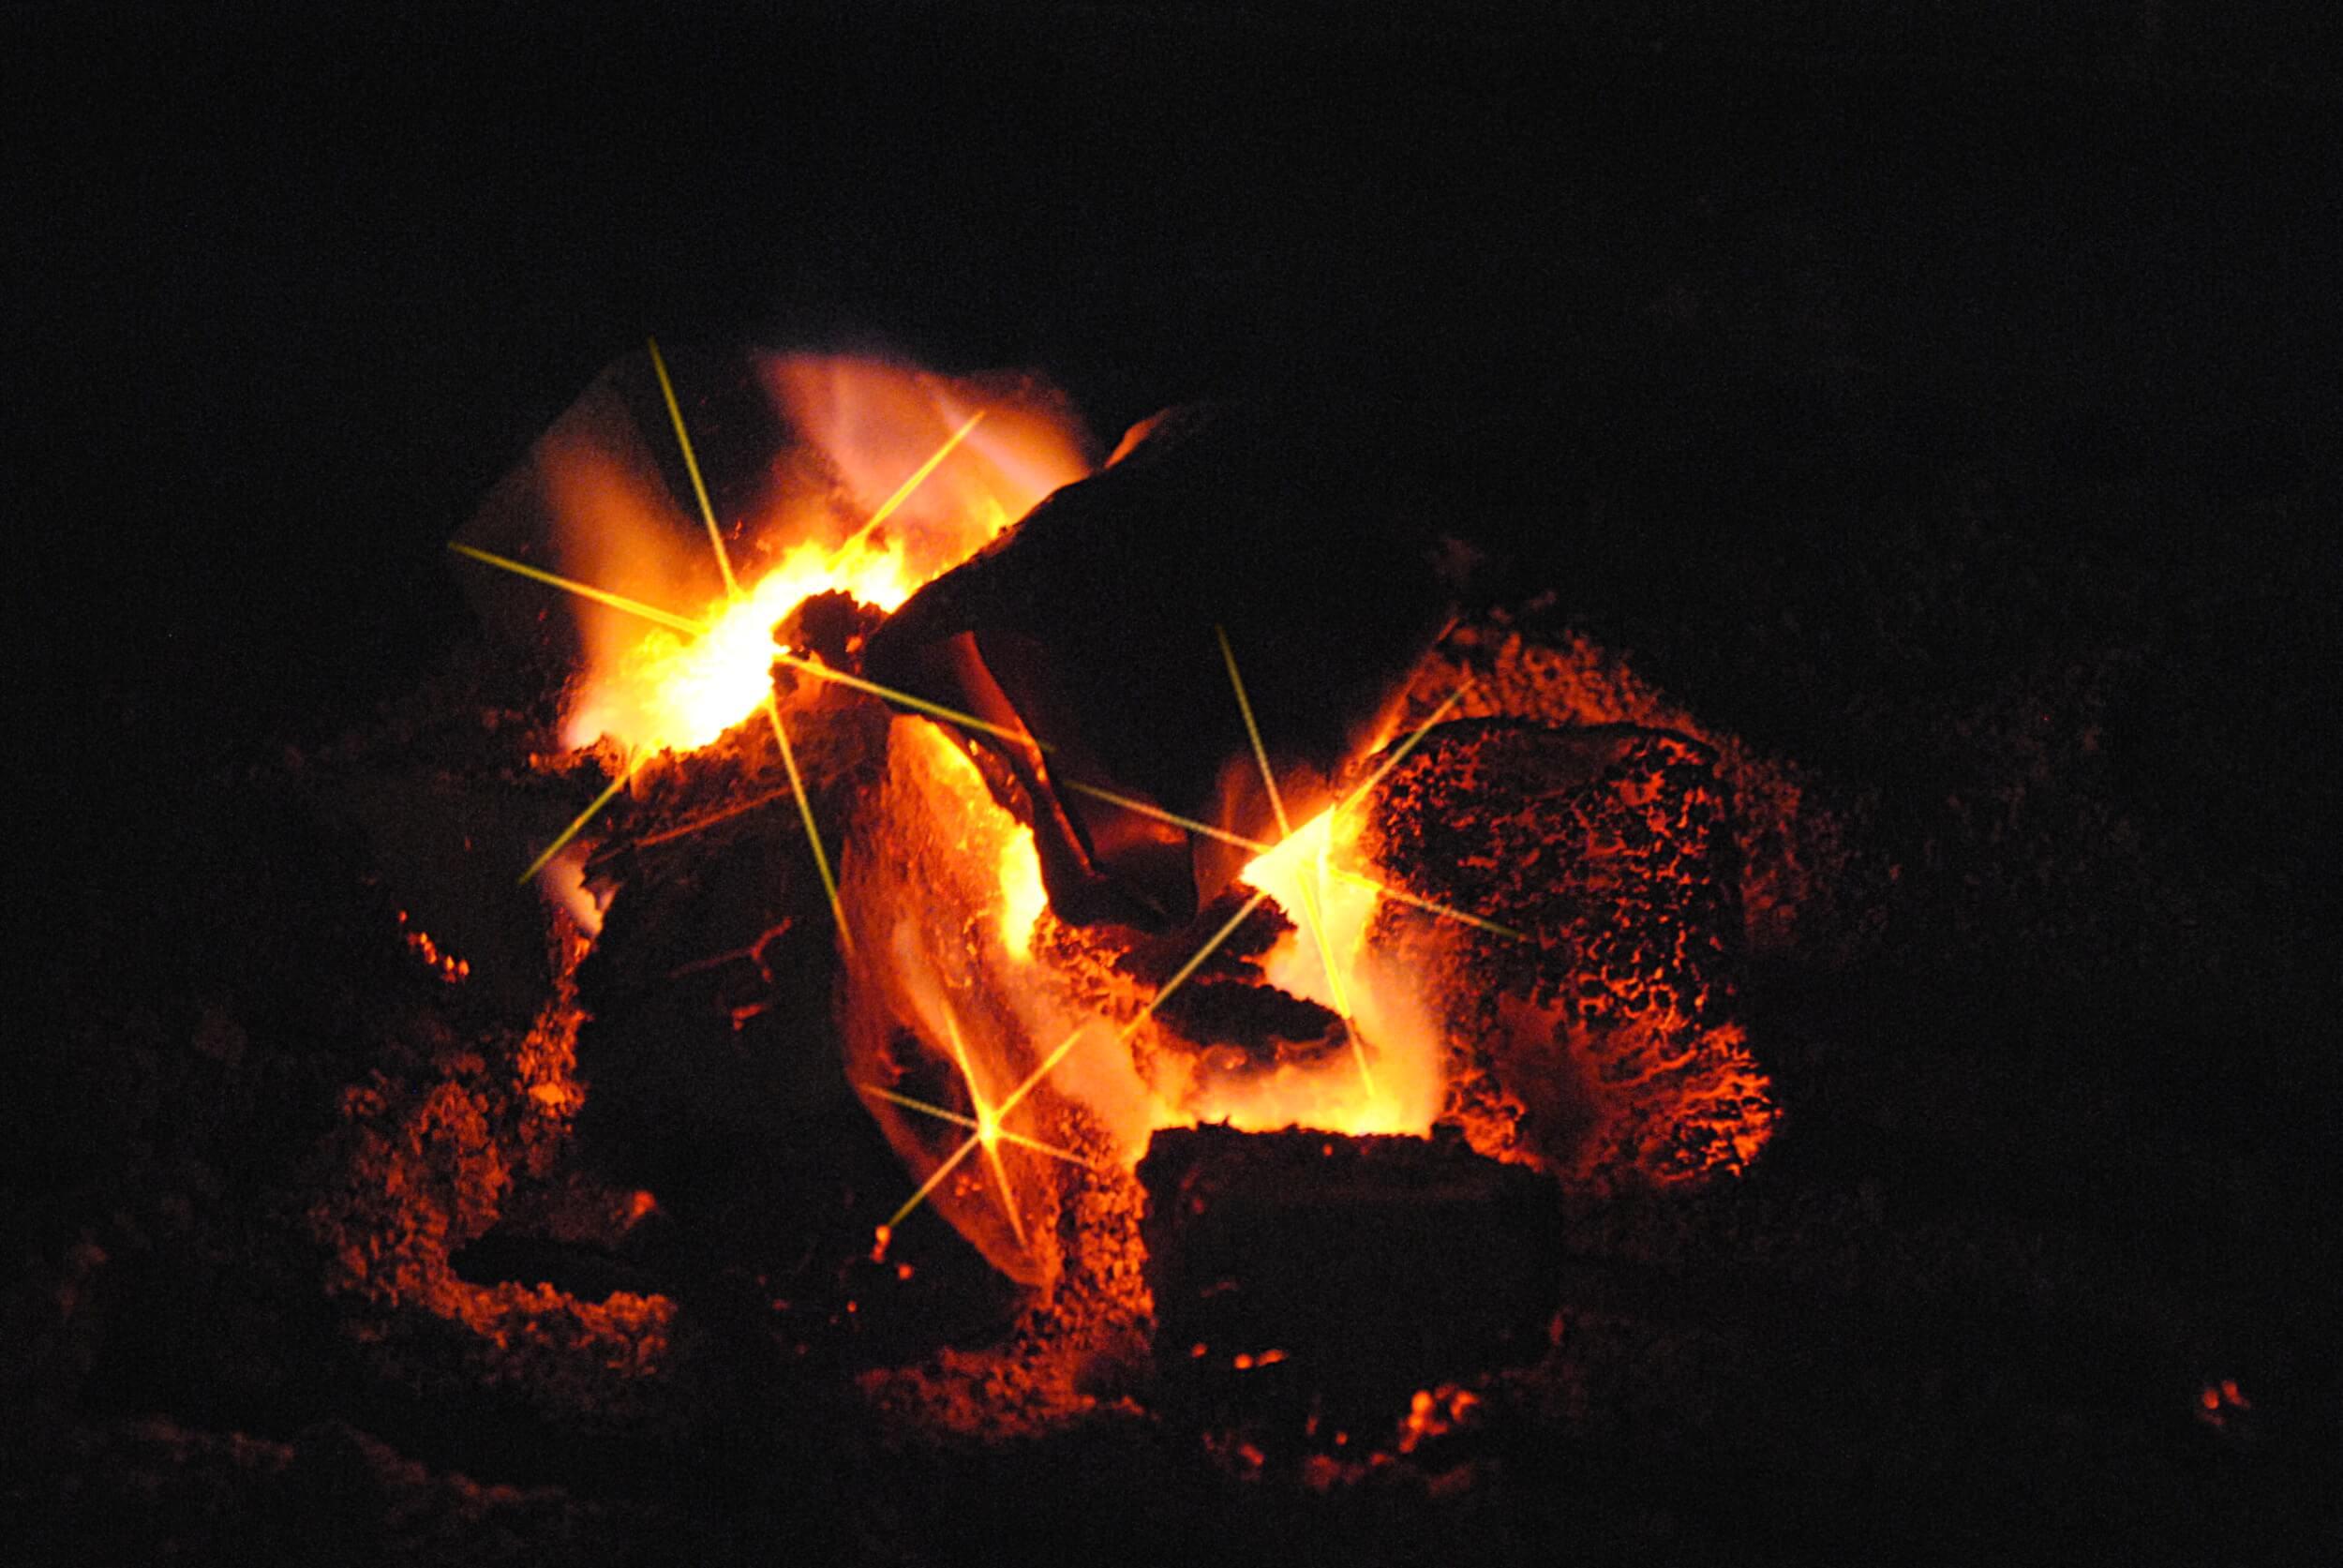 Feuer (c) Klaus Steves / pixelio.de